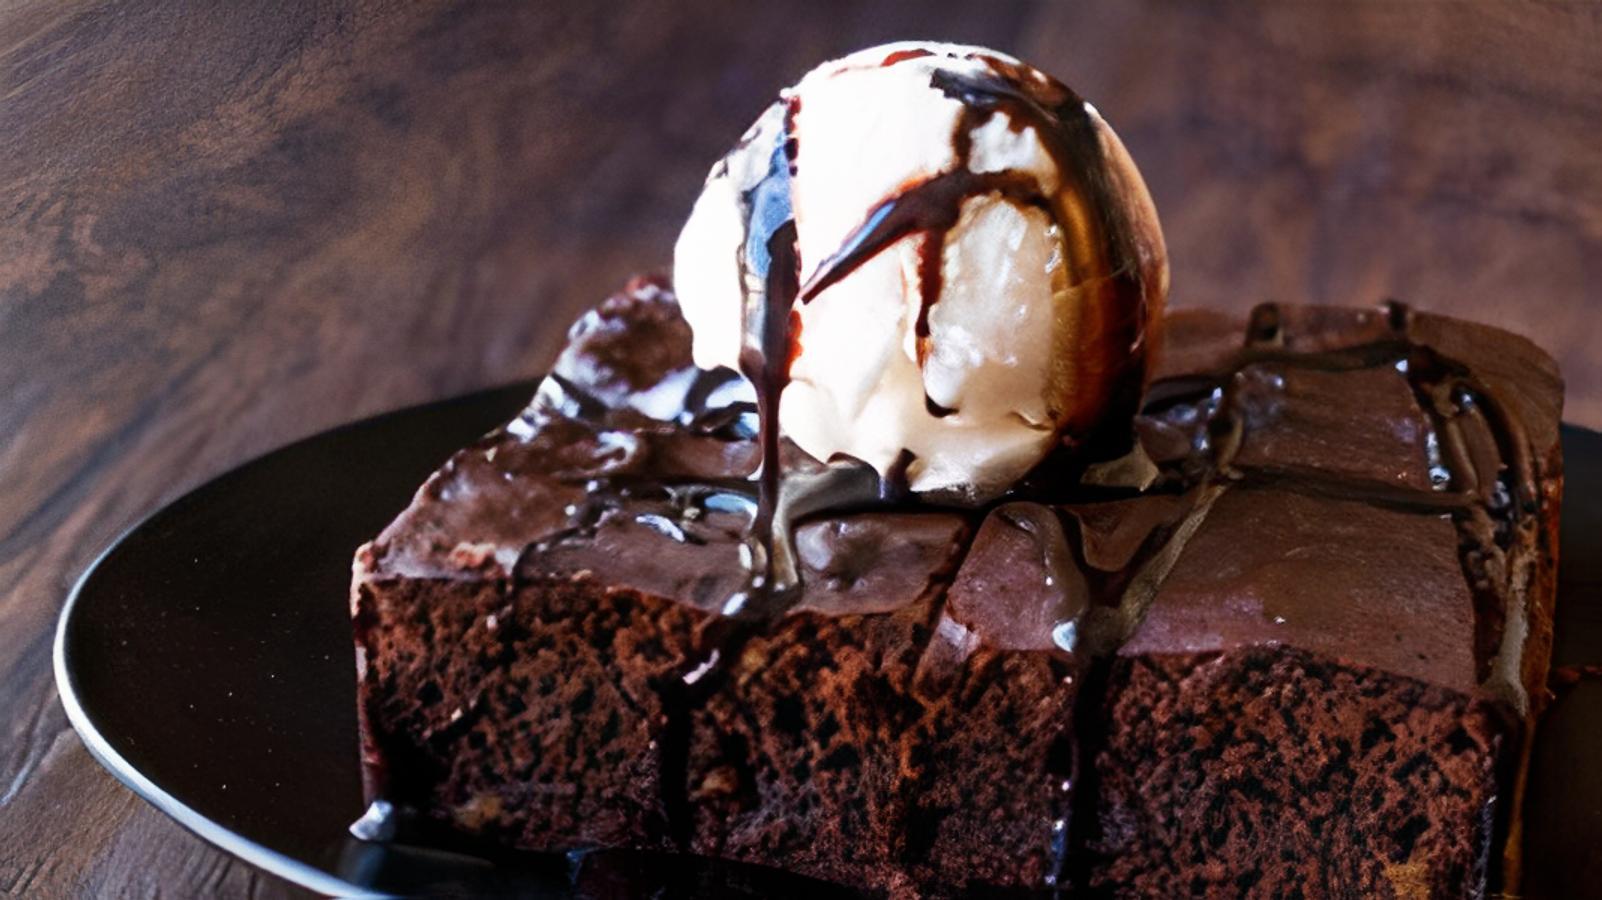 Hot Chocolate Brownie (2 PCS) with Vanilla Ice cream